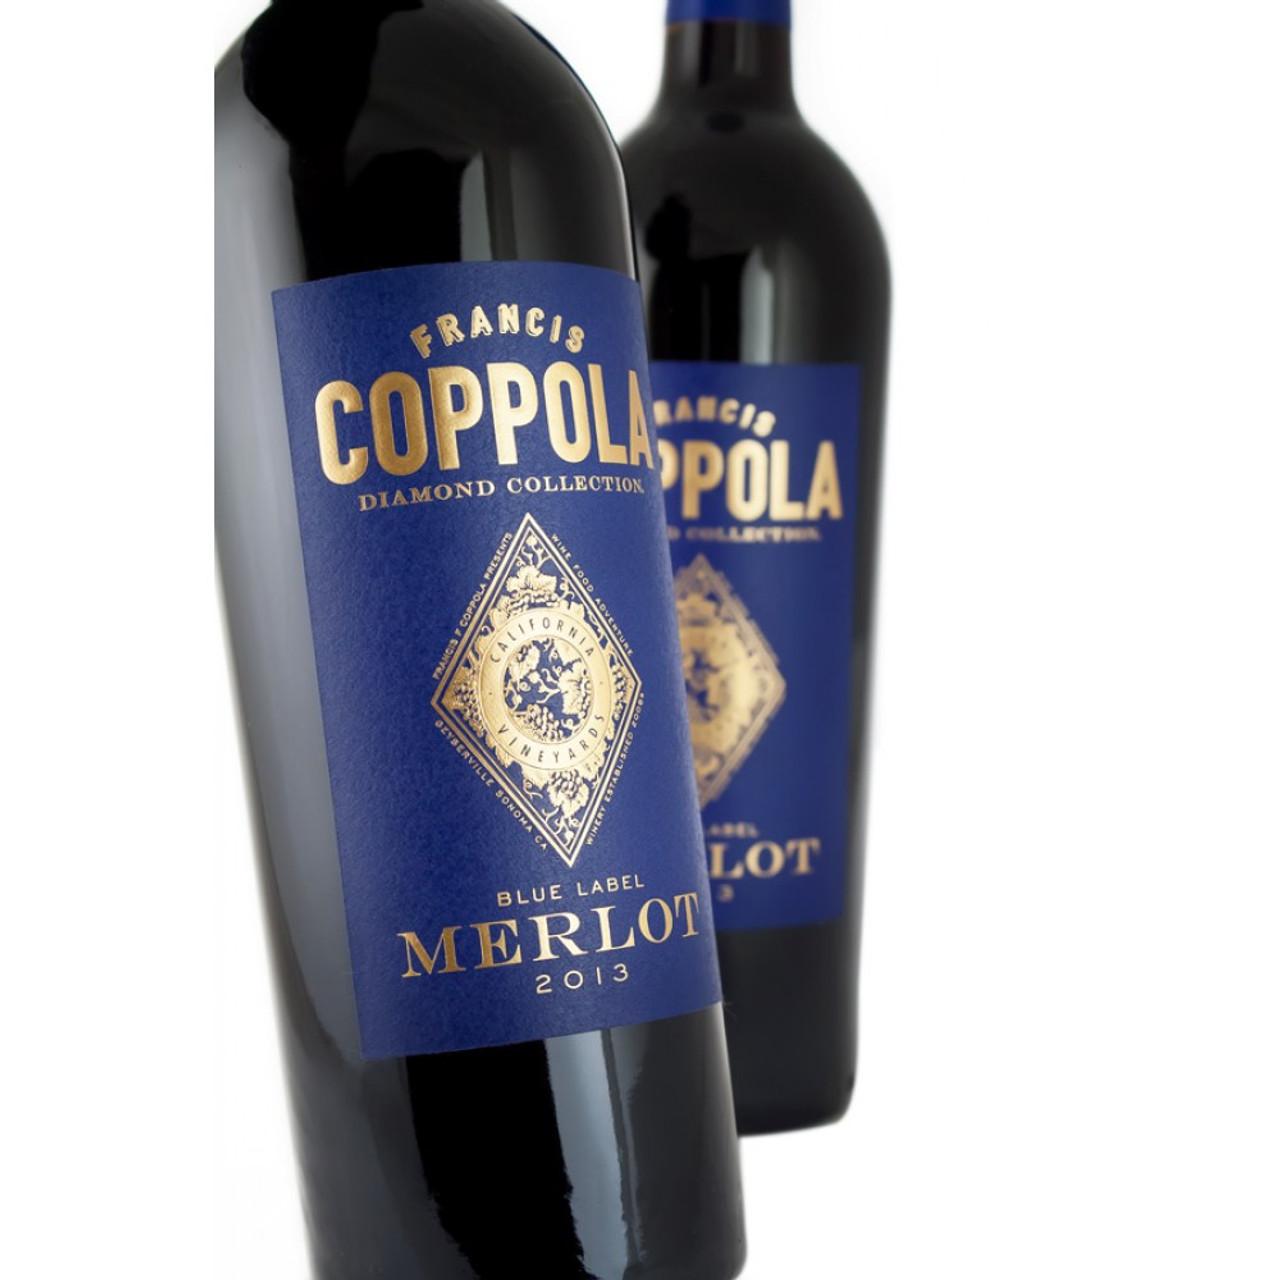 Coppola Merlot